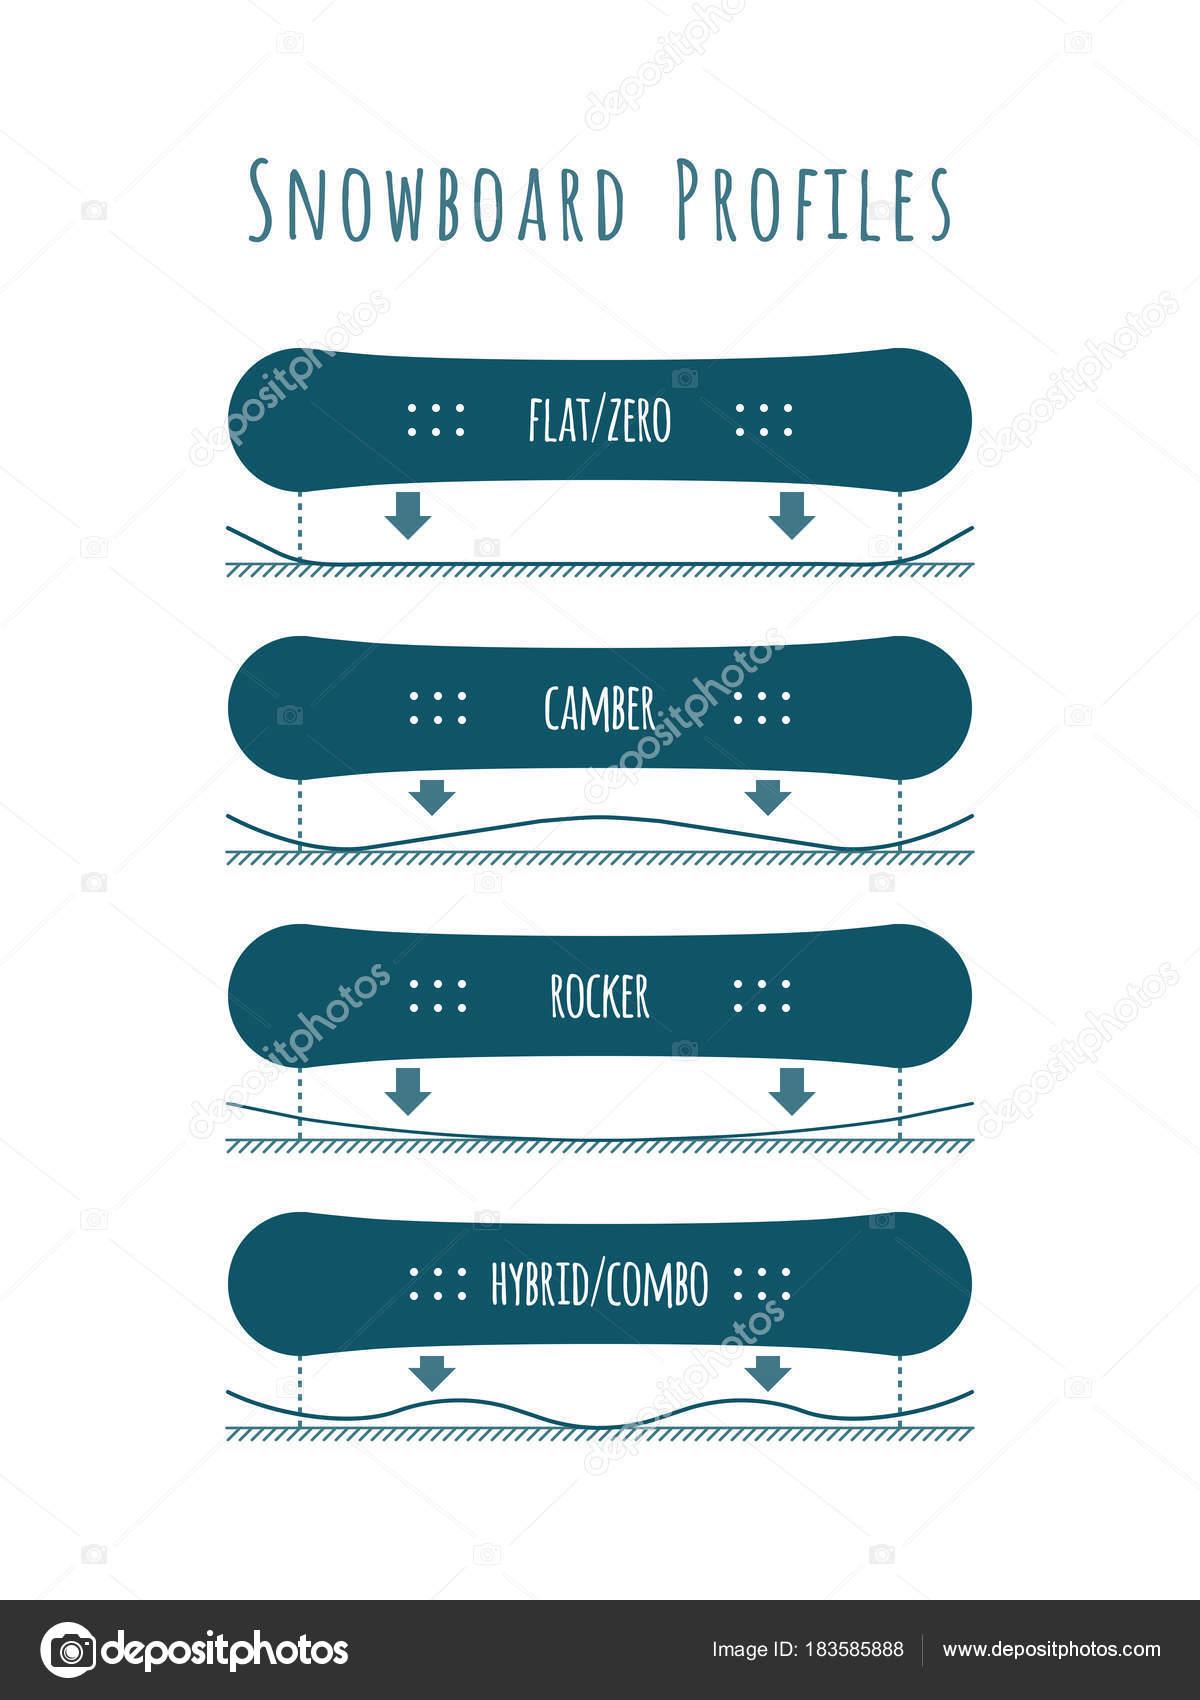 620de628181 Snowboard Profile Types Flat Zero Camber Rocker Hybrid Combo — Stock Vector